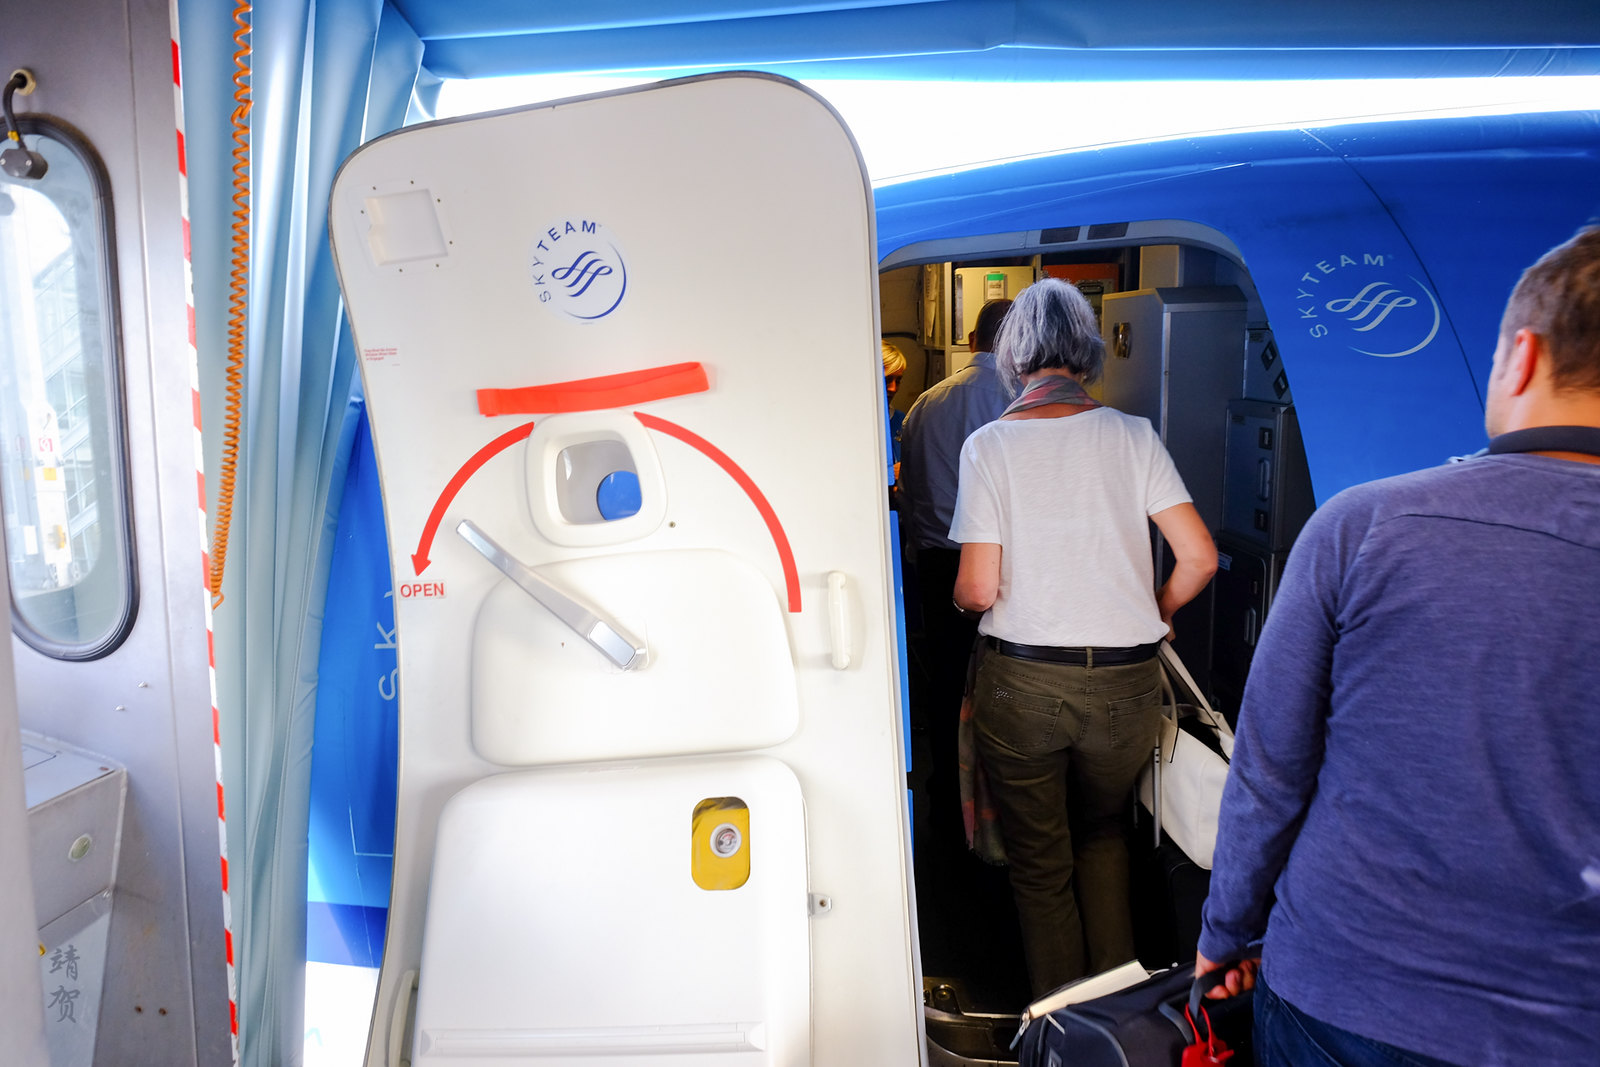 Boarding the KLM jet